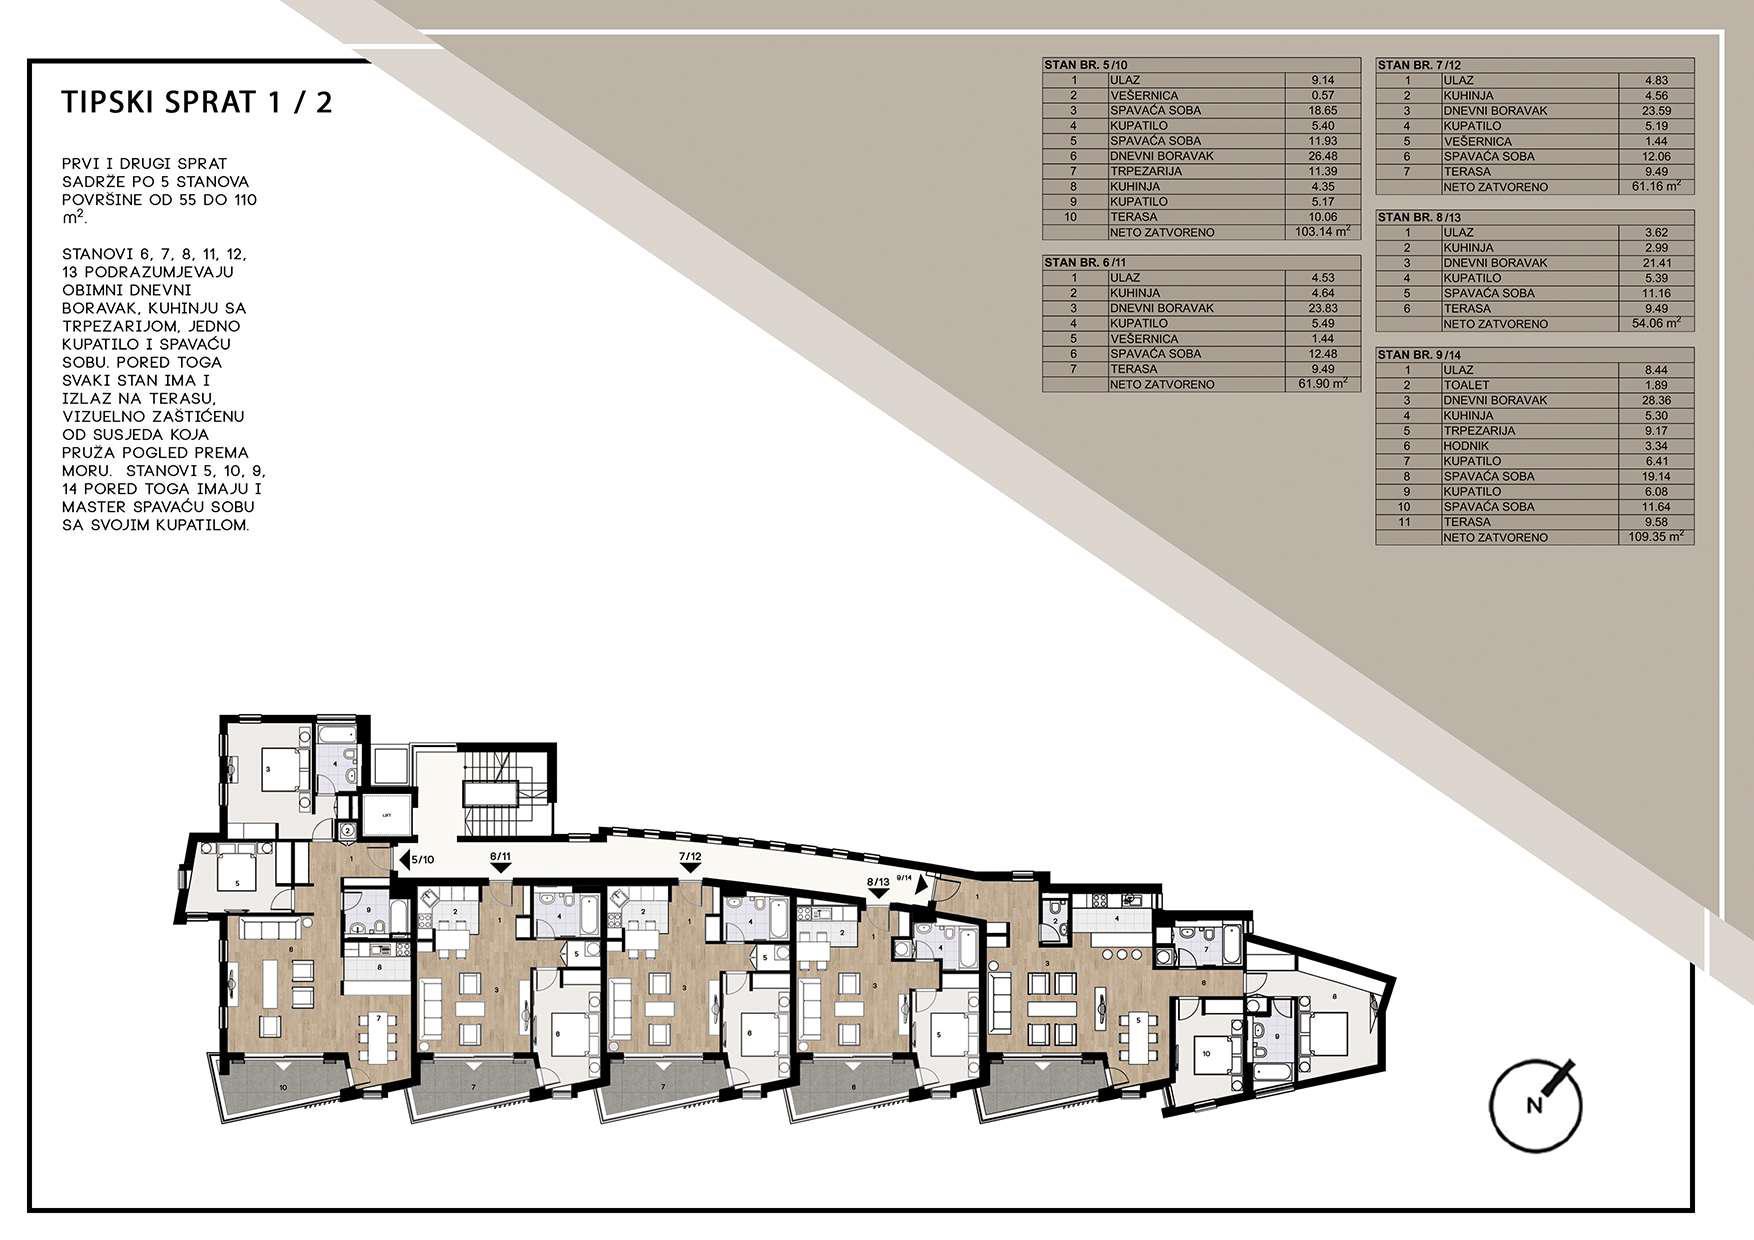 Tipski sprat1 2 Top Result 50 New 7 Bedroom House Plans Gallery 2017 Hgd6